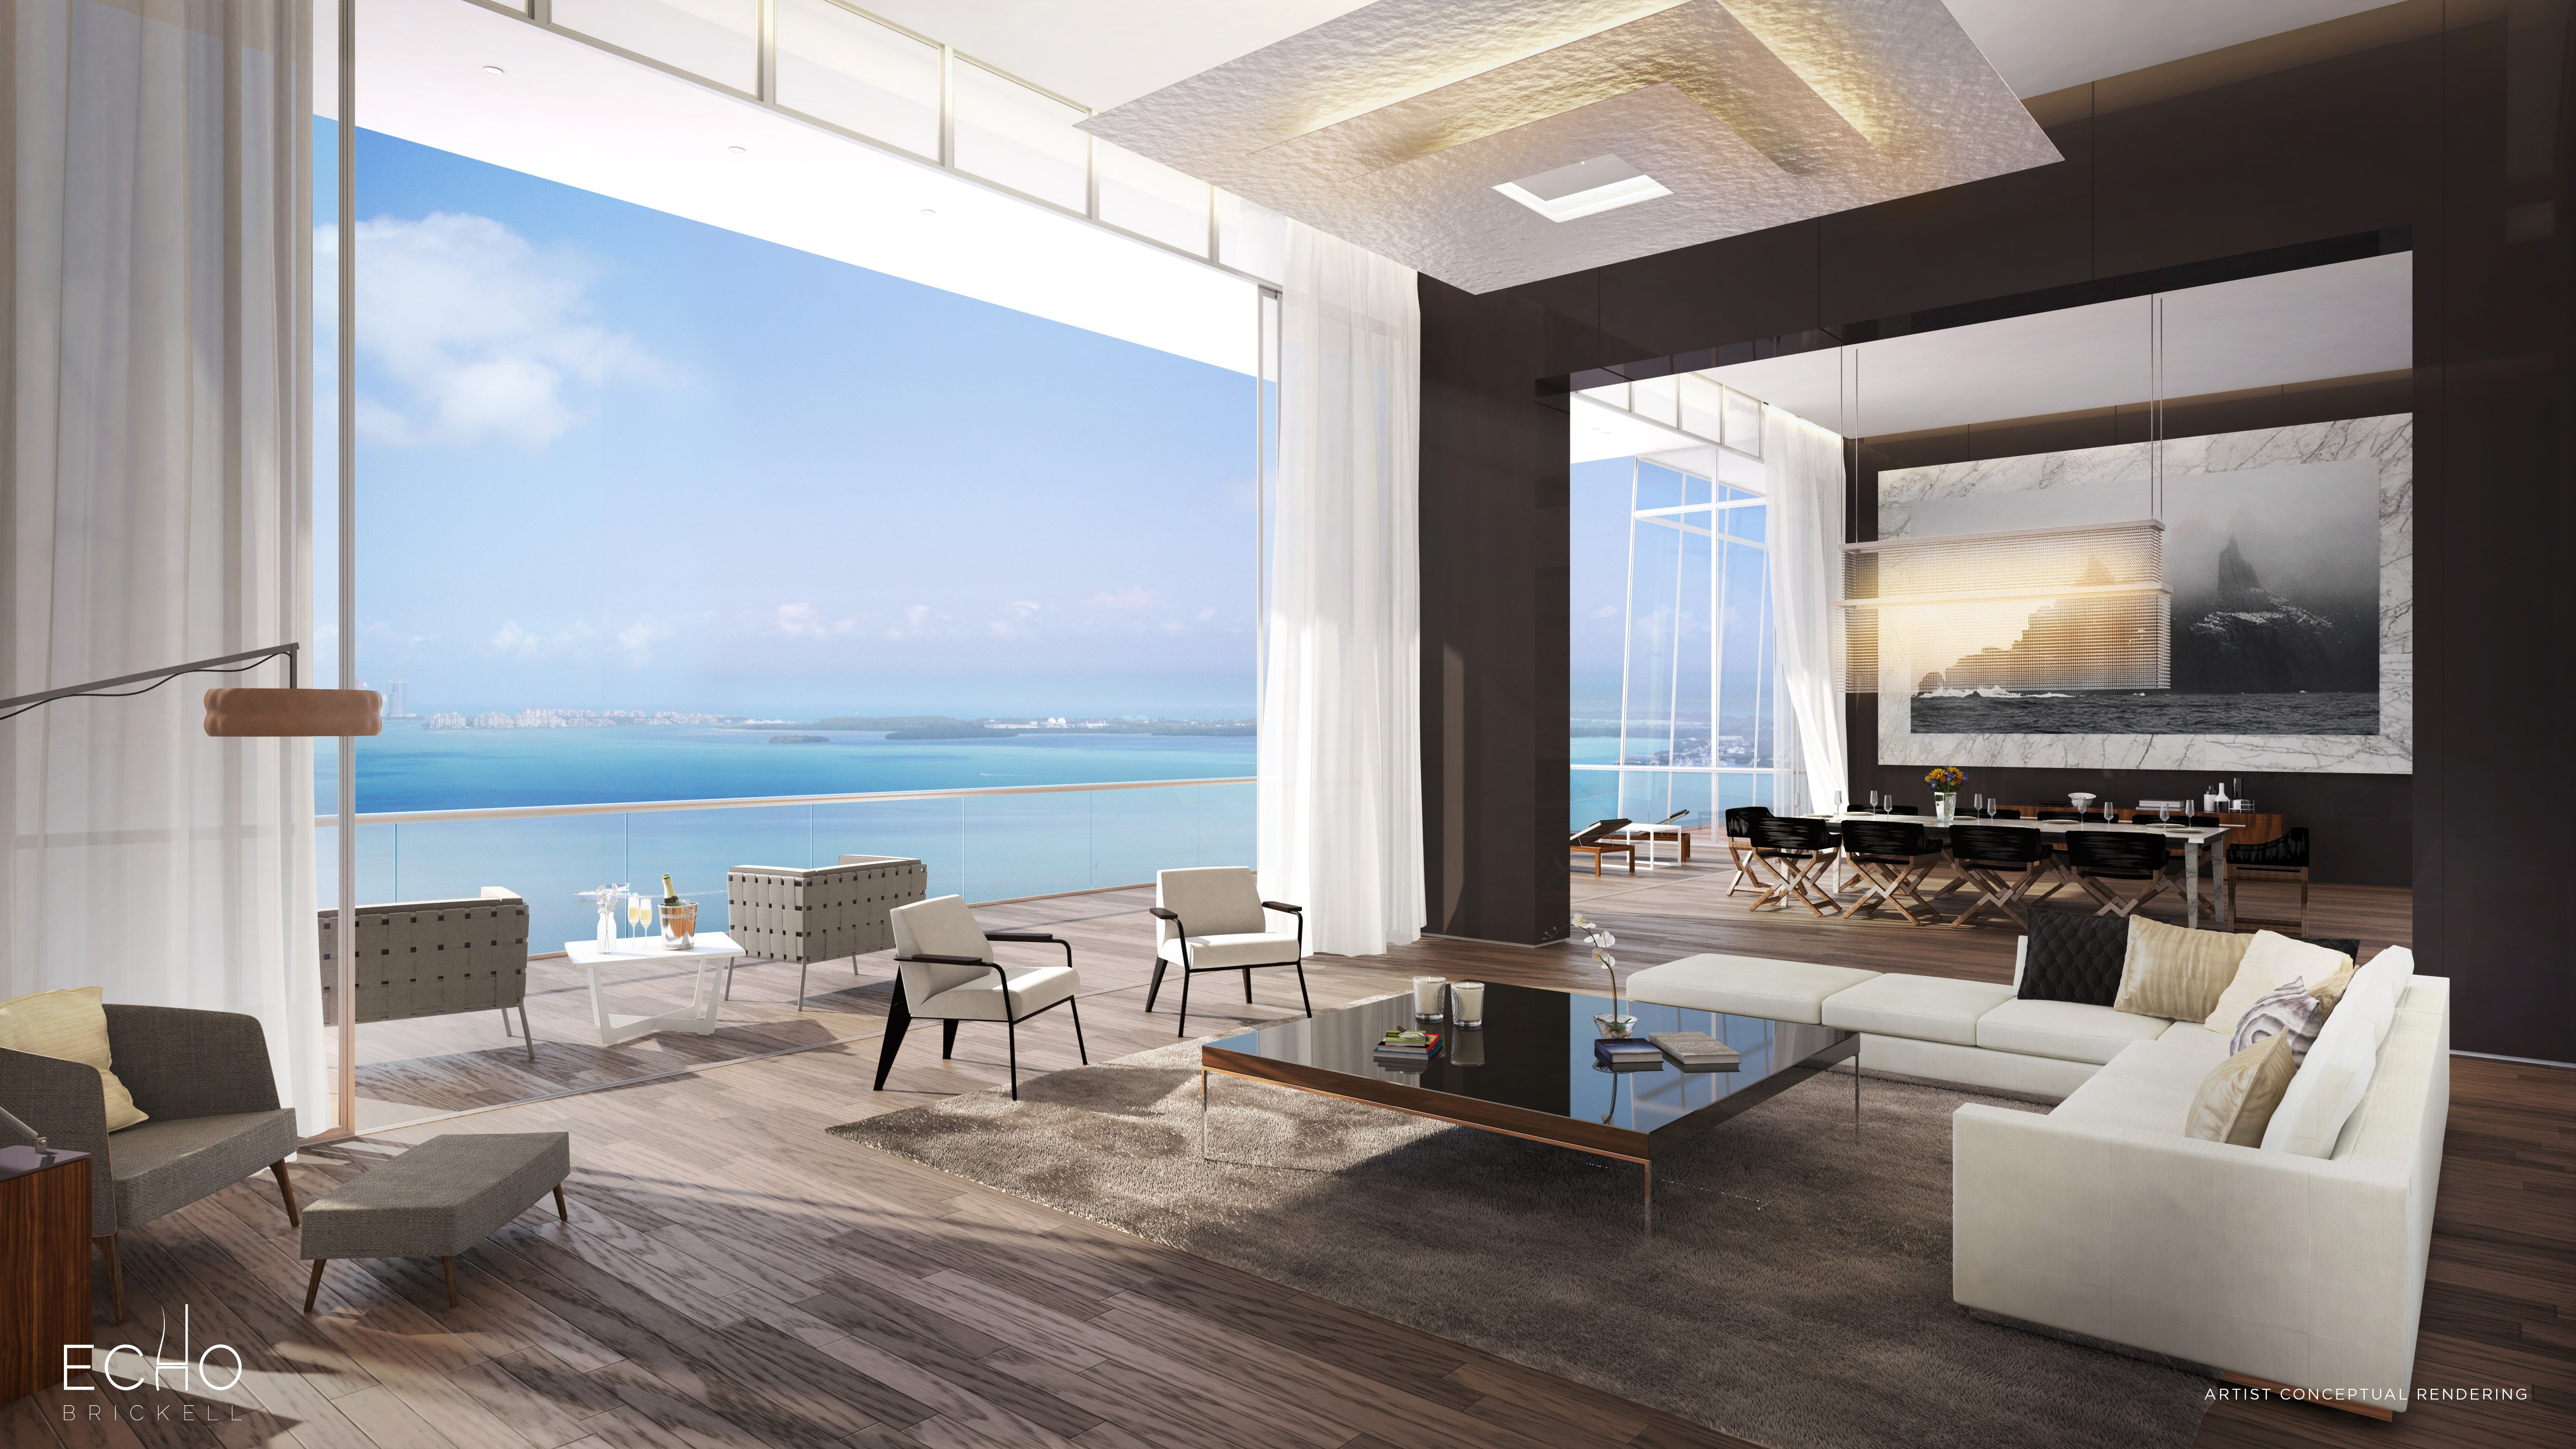 design room house home apartment condo 27 wallpaper background 5000x2813